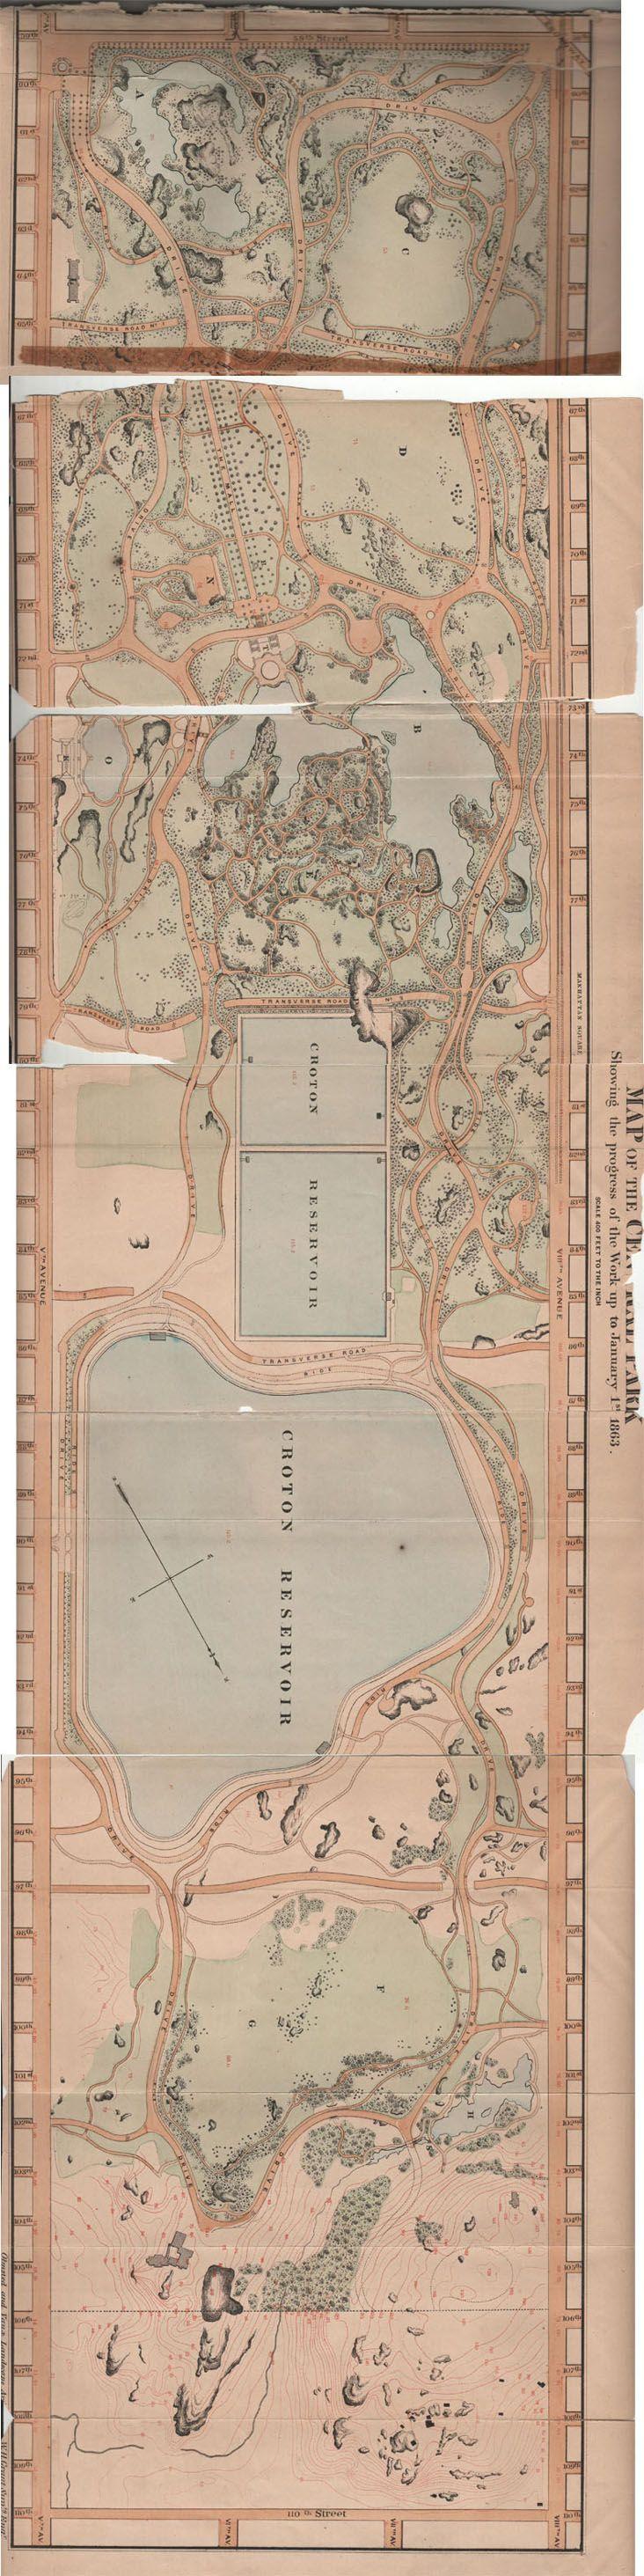 Central Park Map 1863 179 best Map